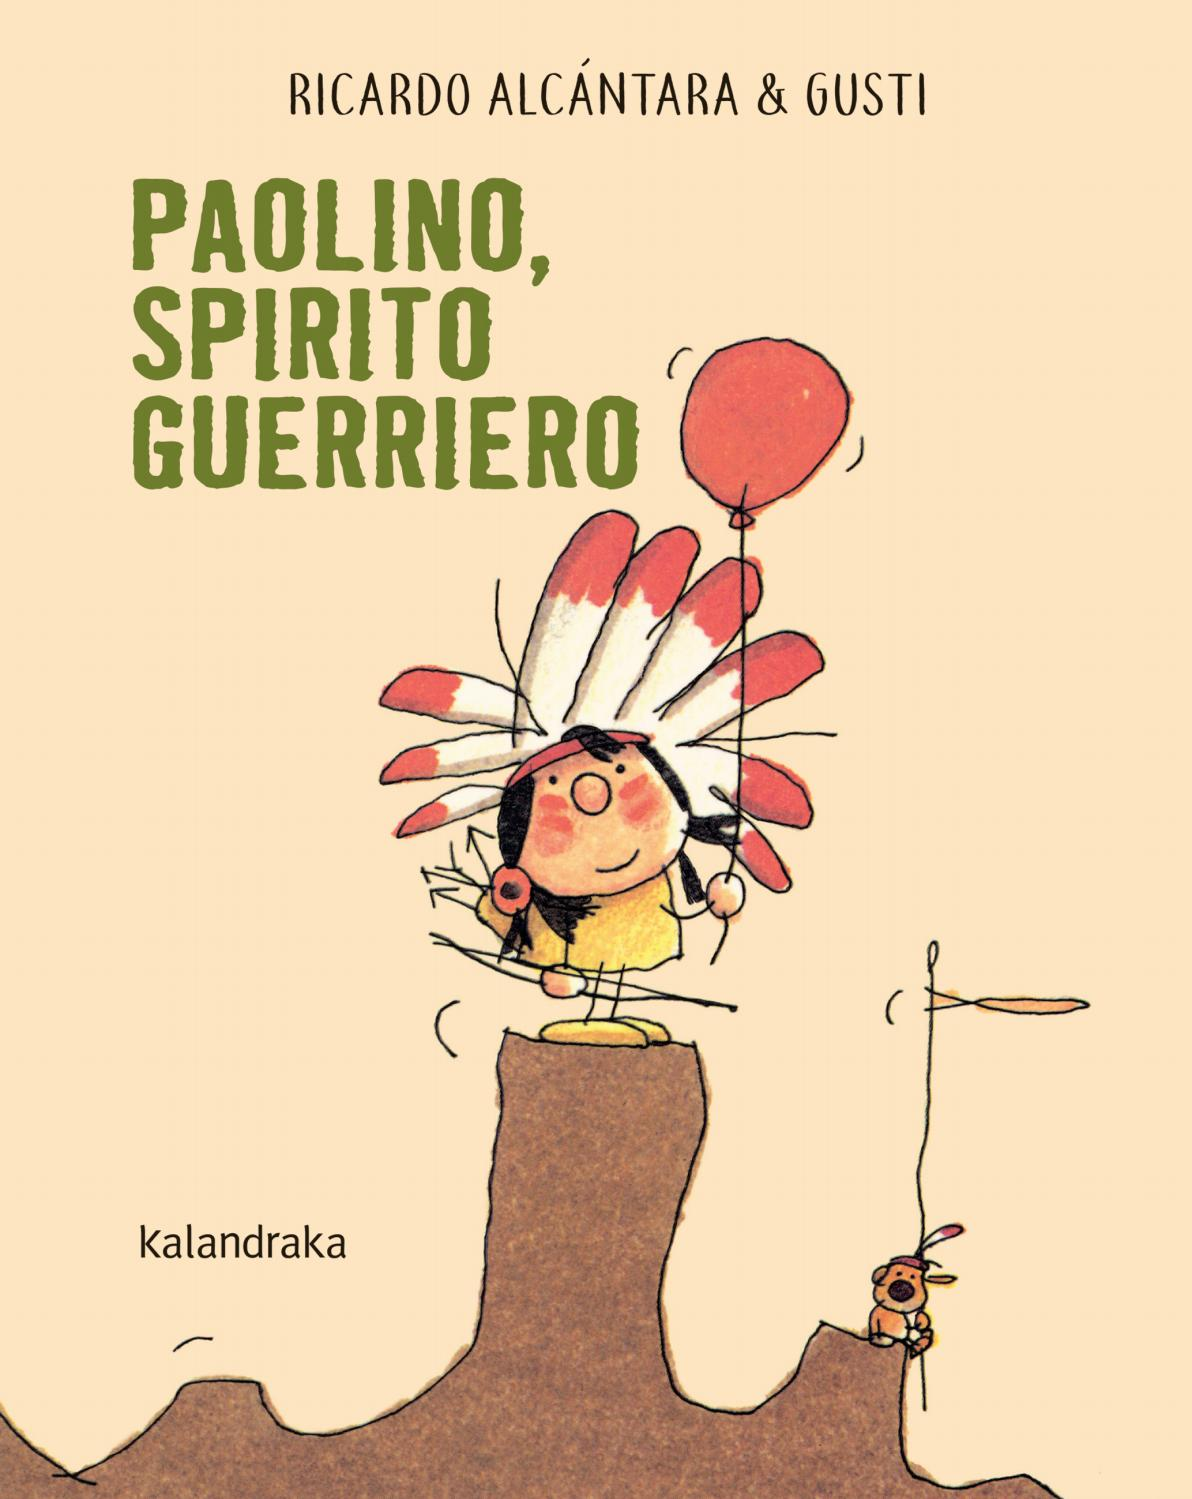 Paolino, spirito guerriero